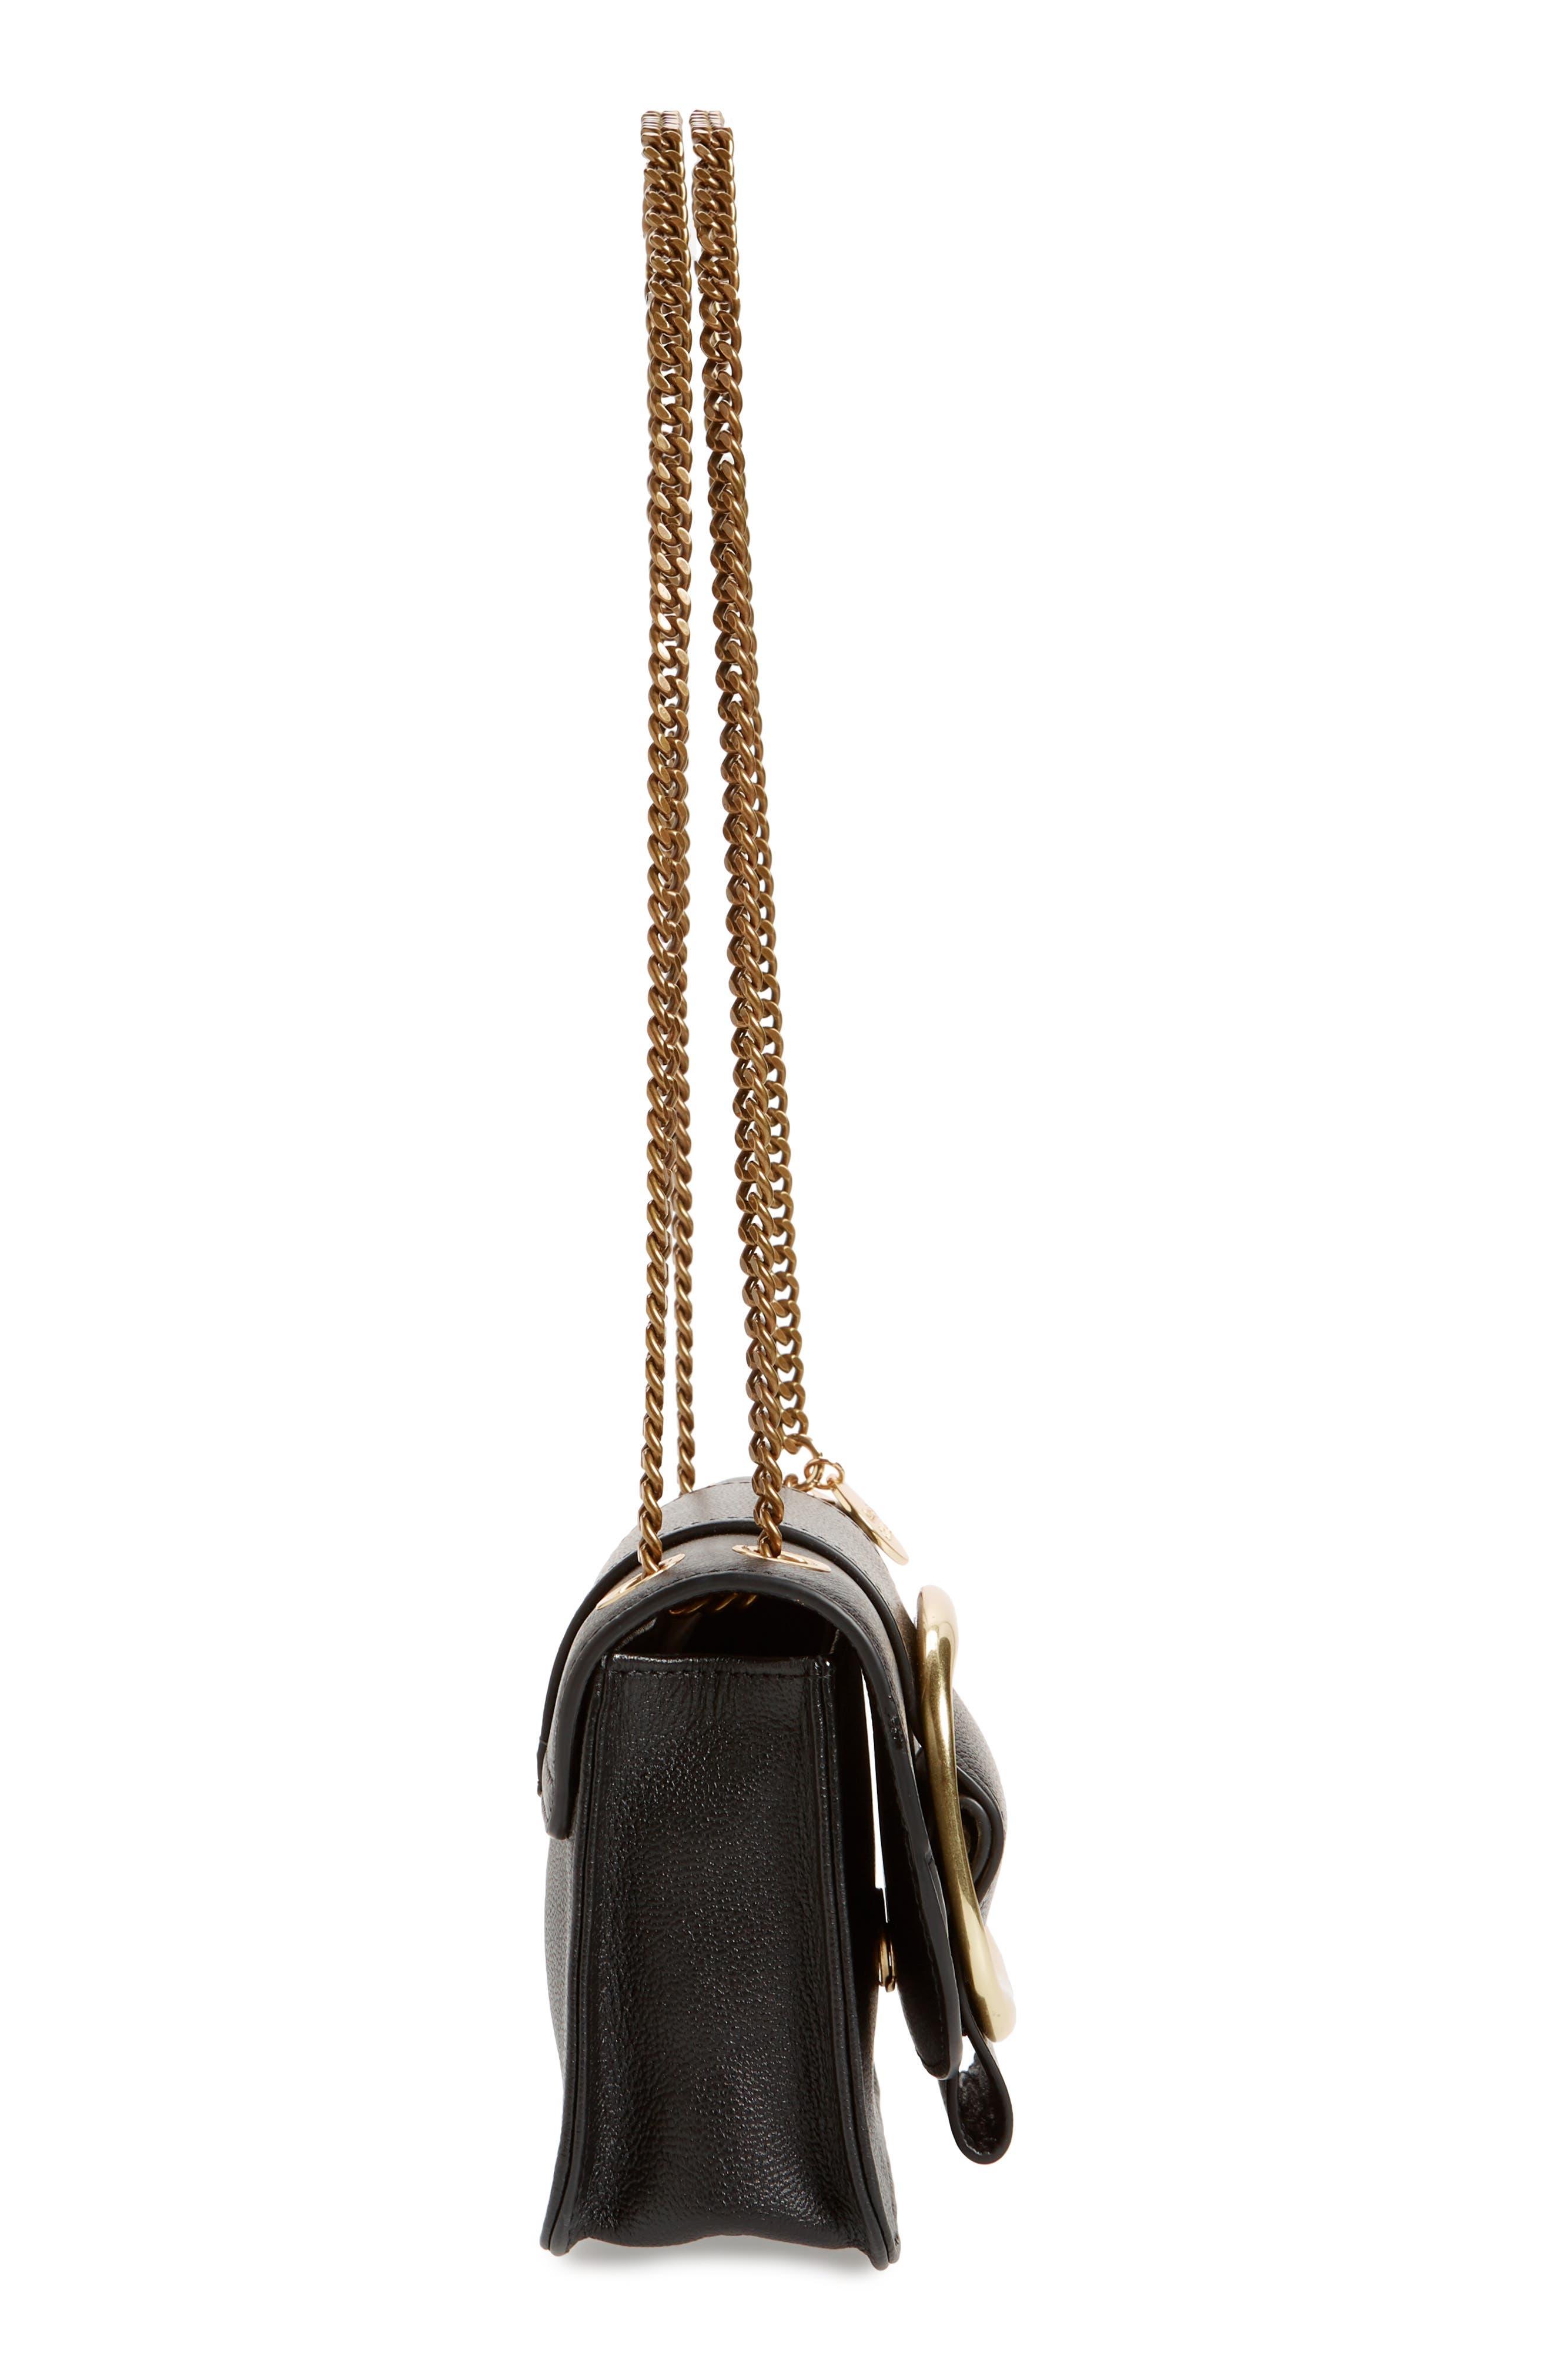 SEE BY CHLOÉ, Hopper Leather Shoulder Bag, Alternate thumbnail 6, color, 001